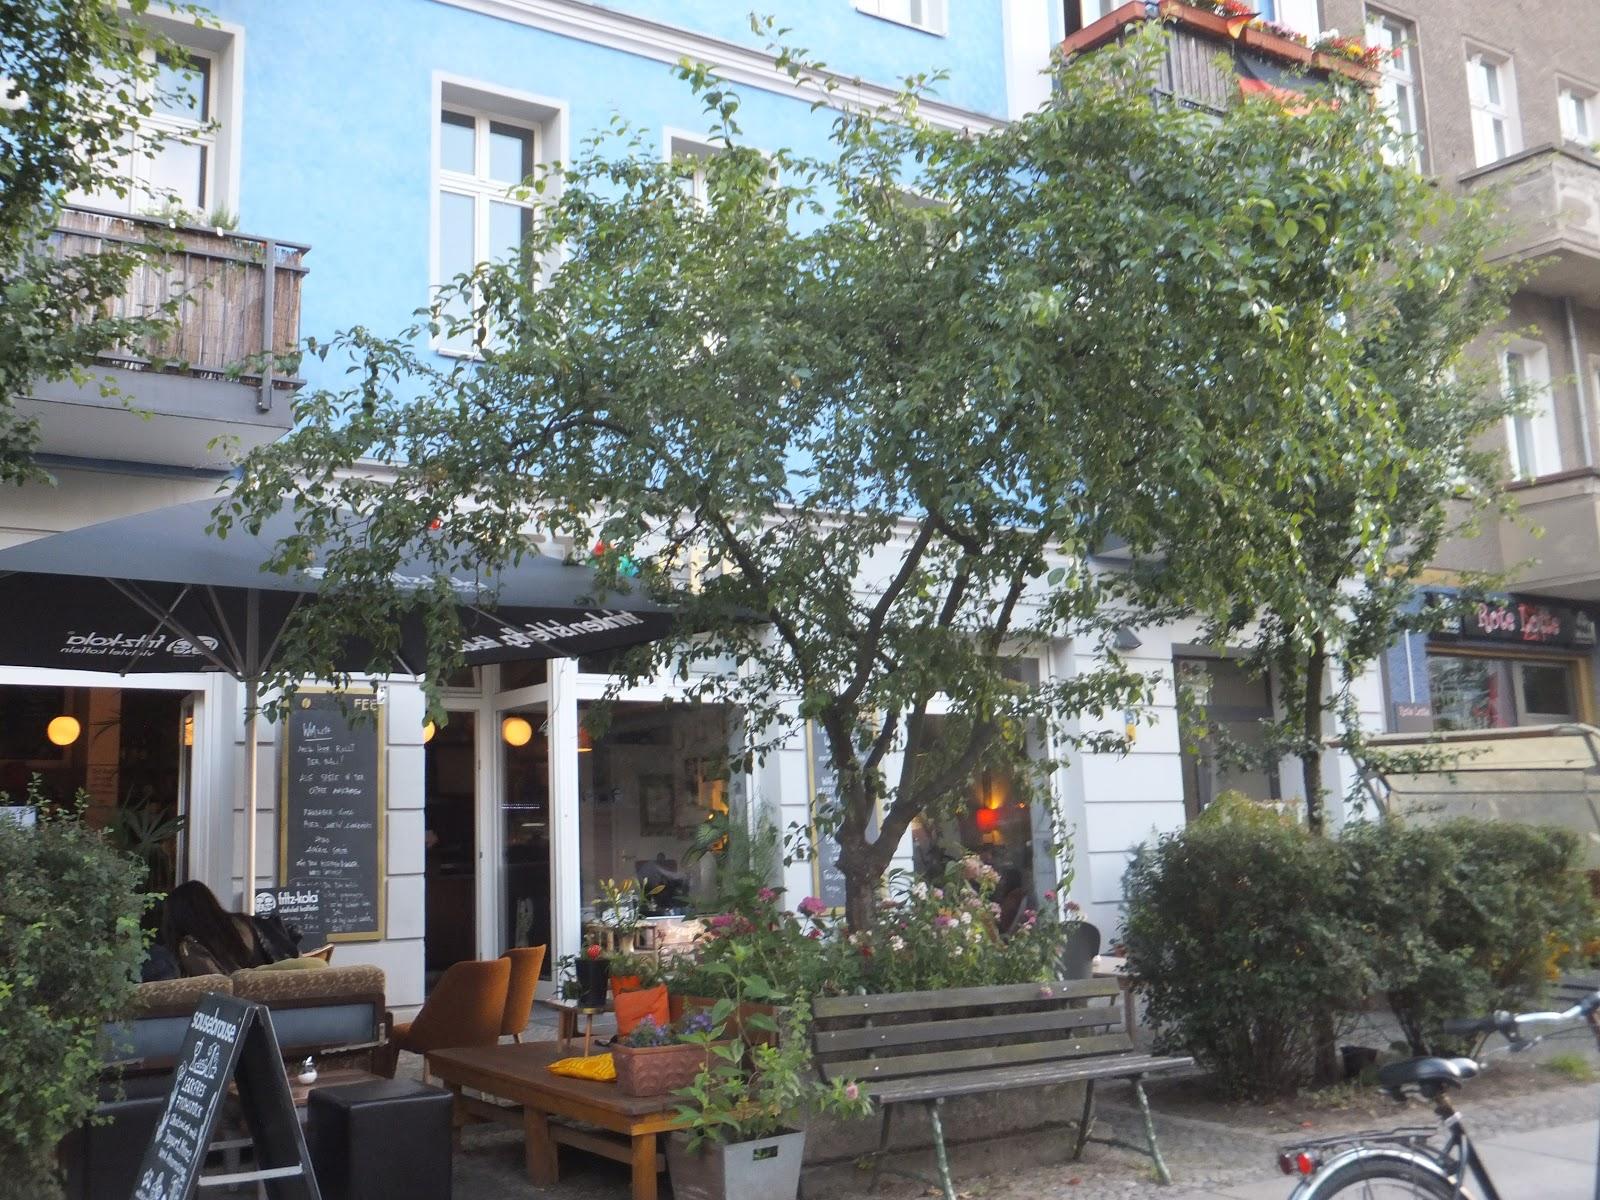 PrenslauerBerg, Berlín, Elisa N, Blog de Viajes, Lifestyle, Travel